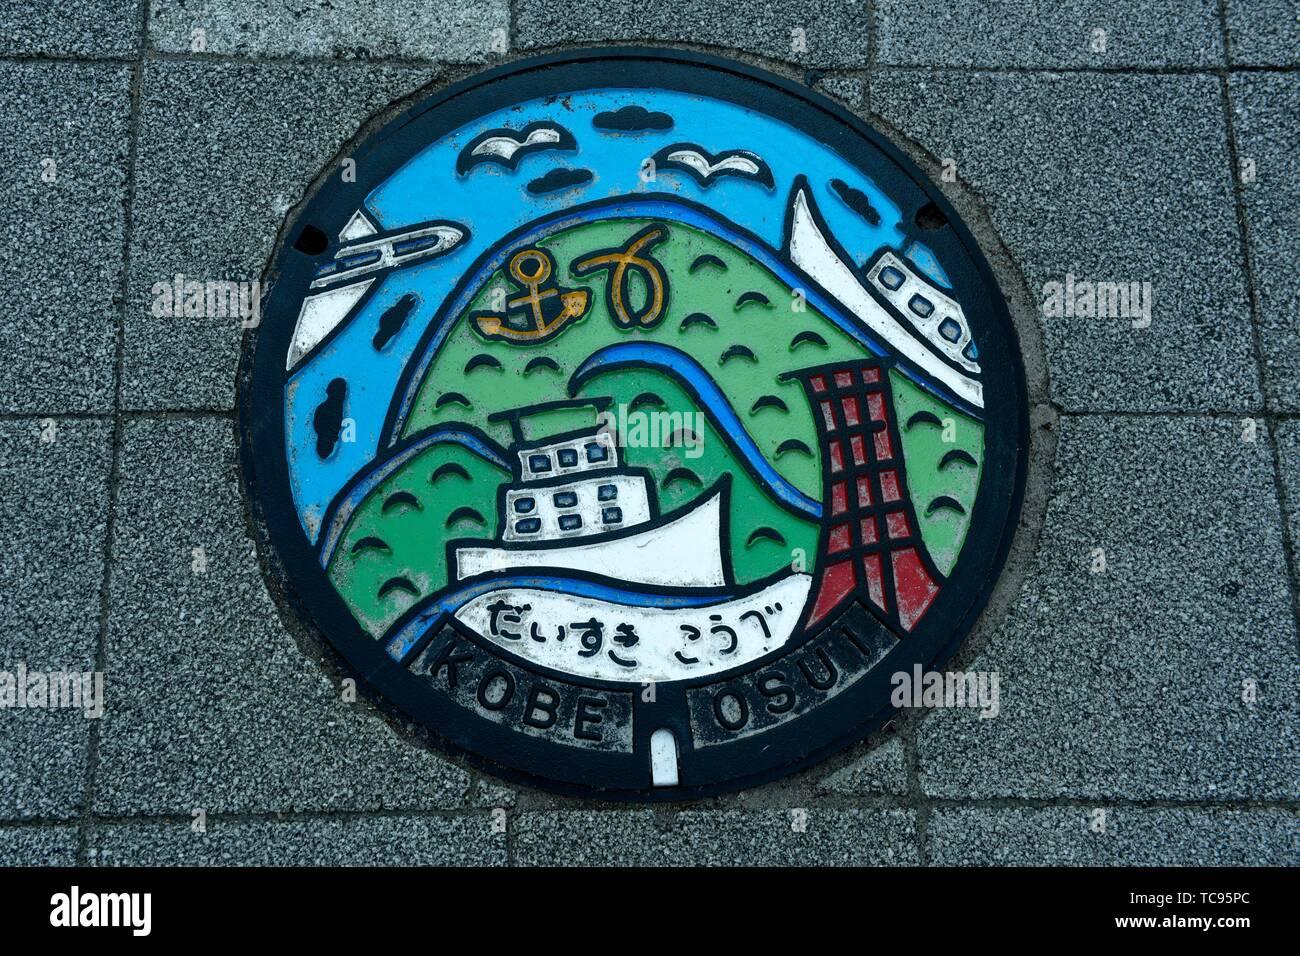 Manhole cover, Tokyo, Japan, Asia. - Stock Image